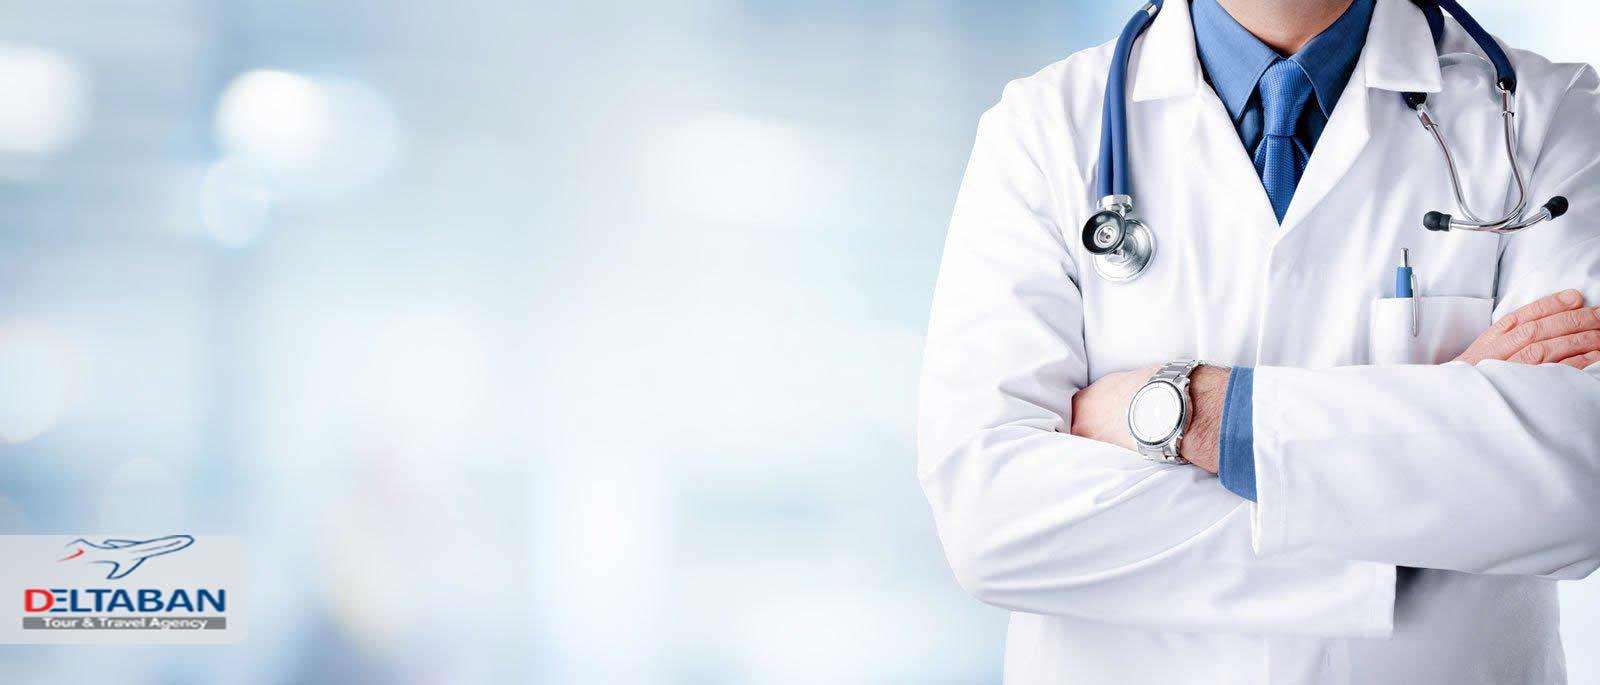 مراکز درمانی کیش